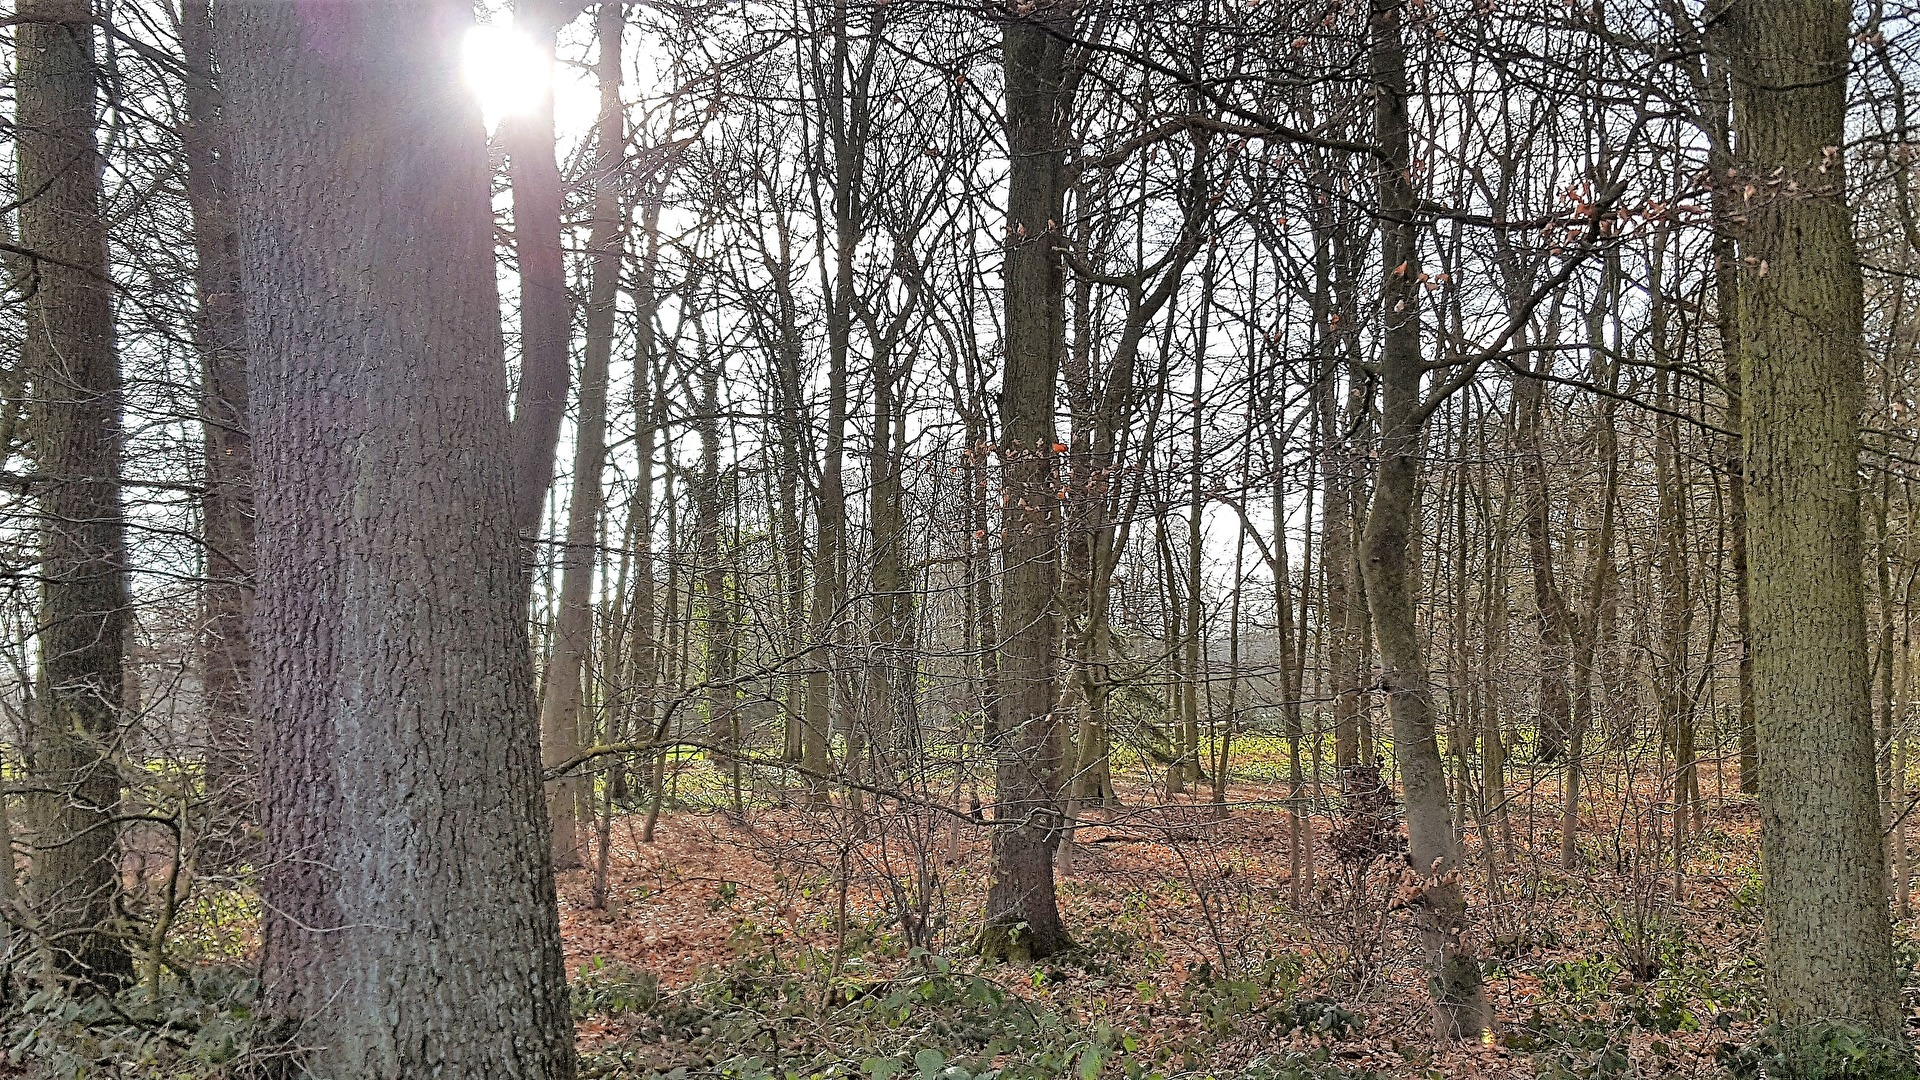 Sonnenstrahlen fallen in den Wald